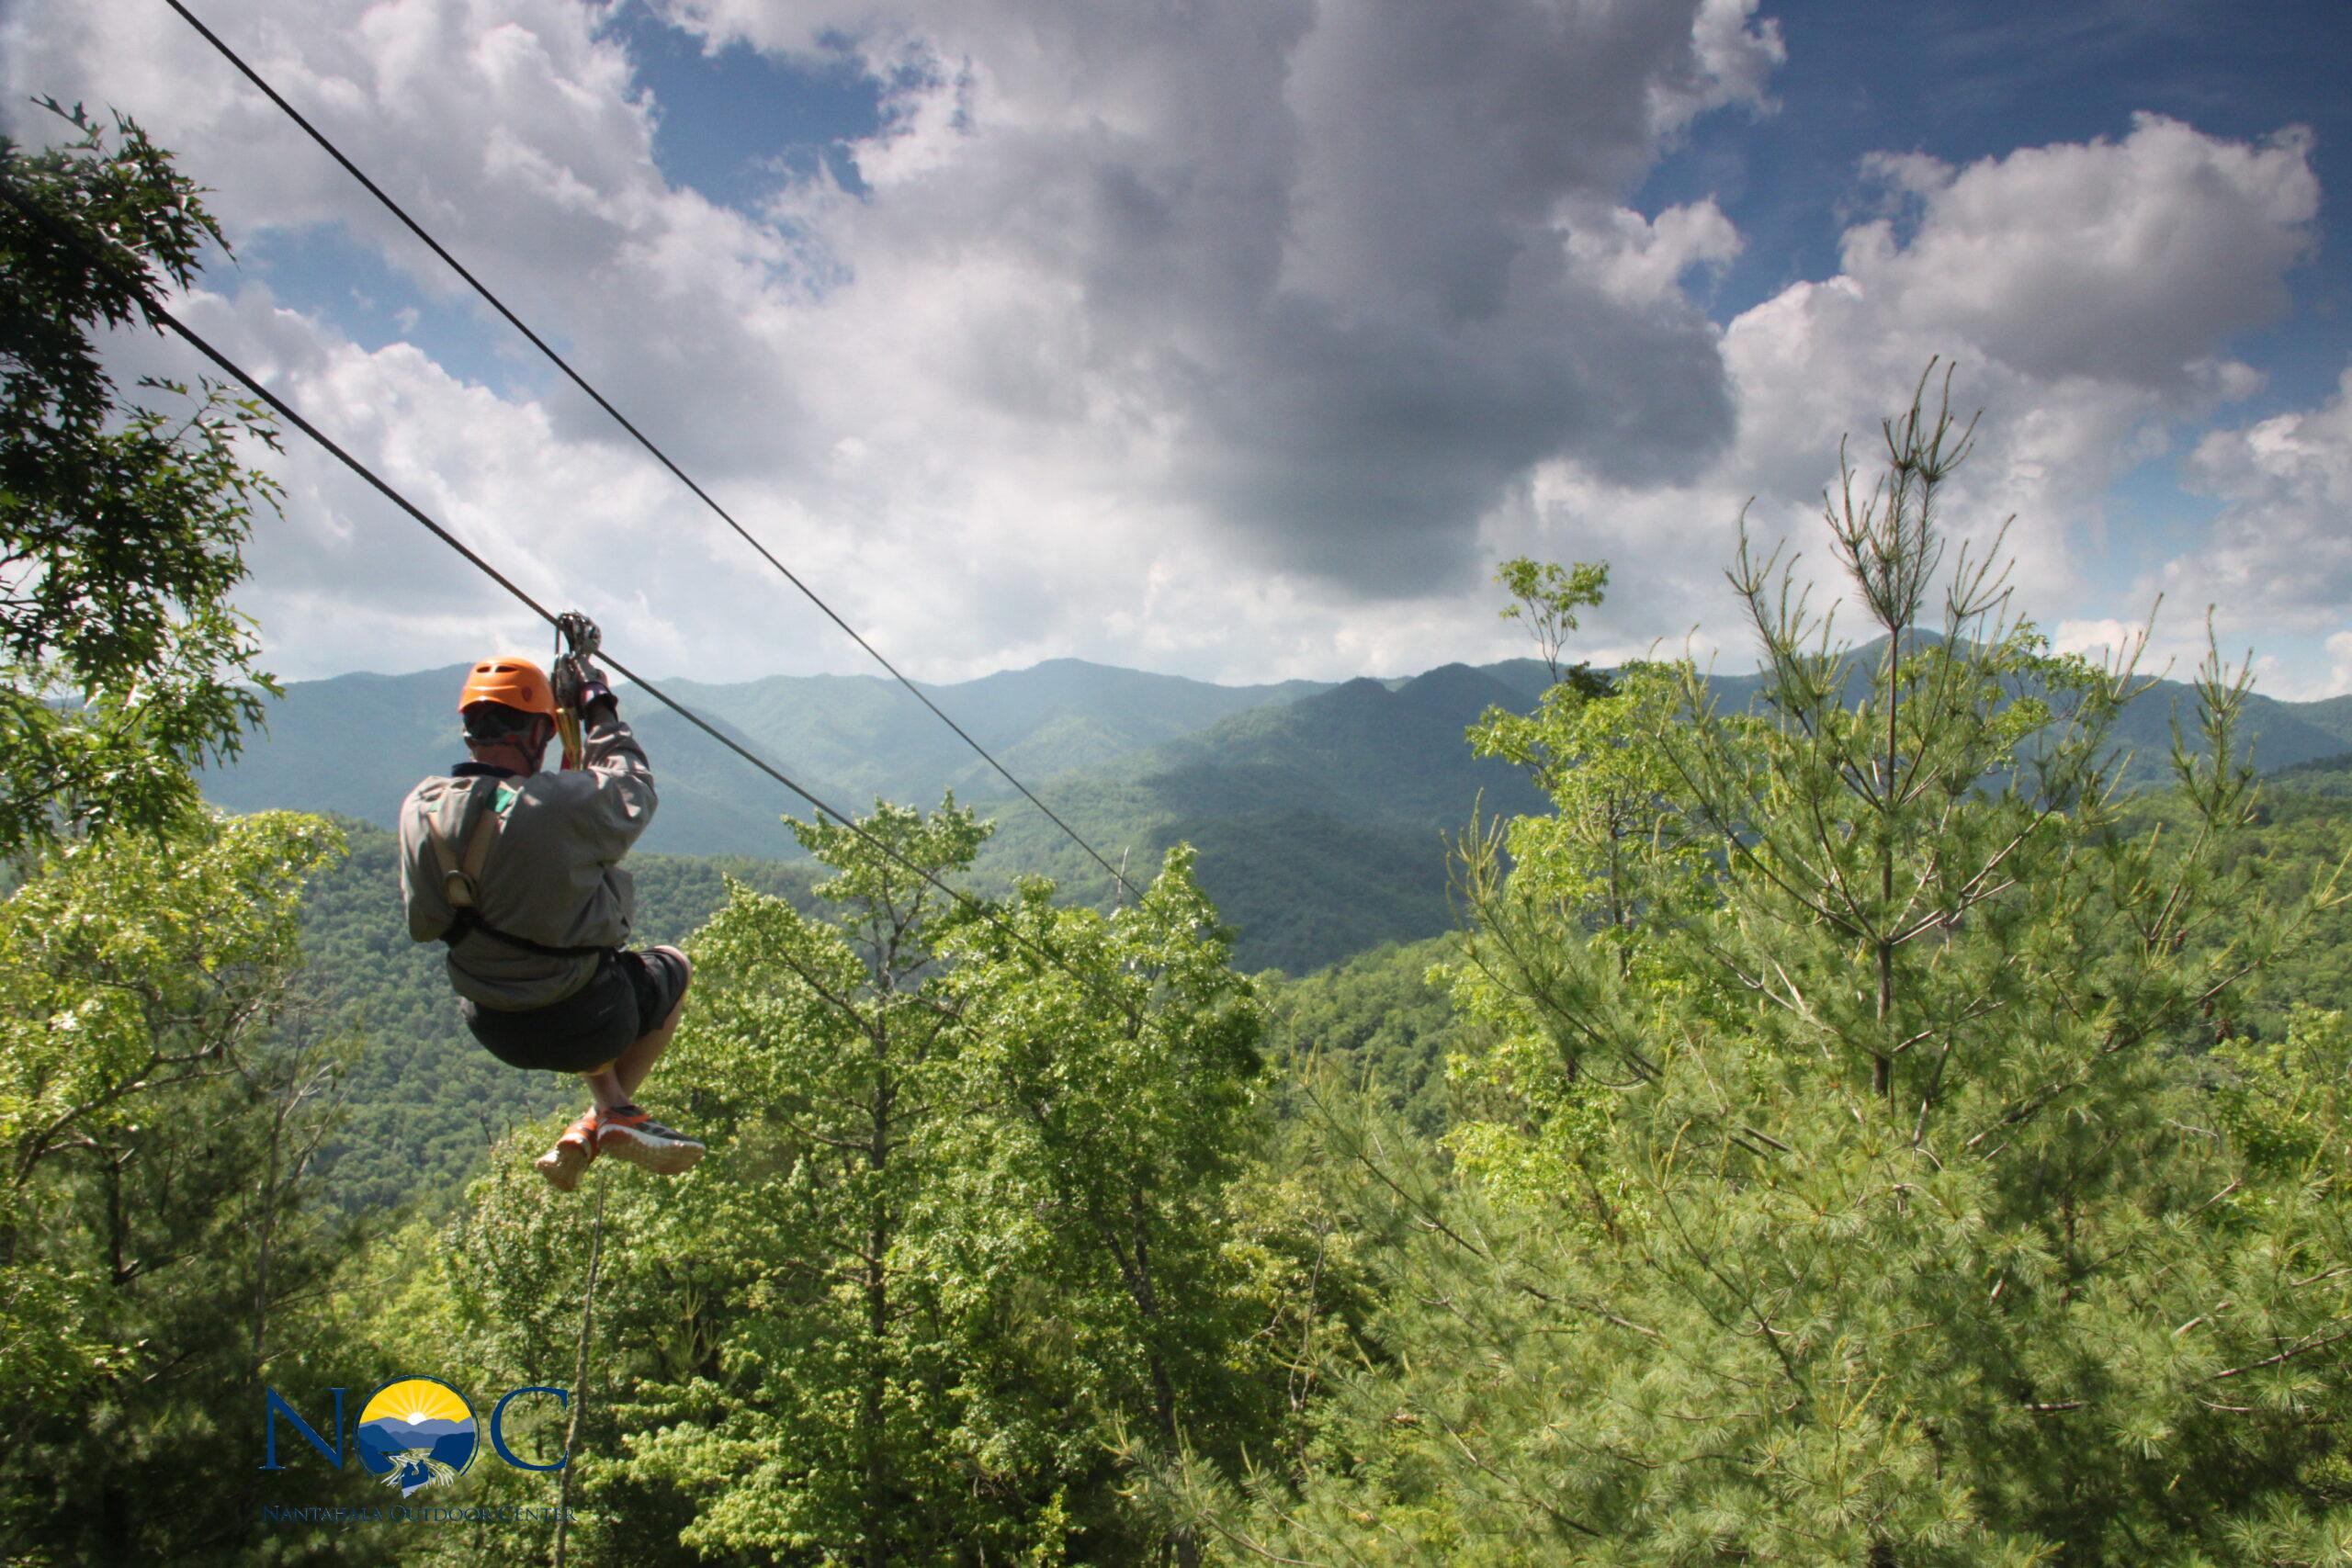 Ziplining in the Smokey Mountains